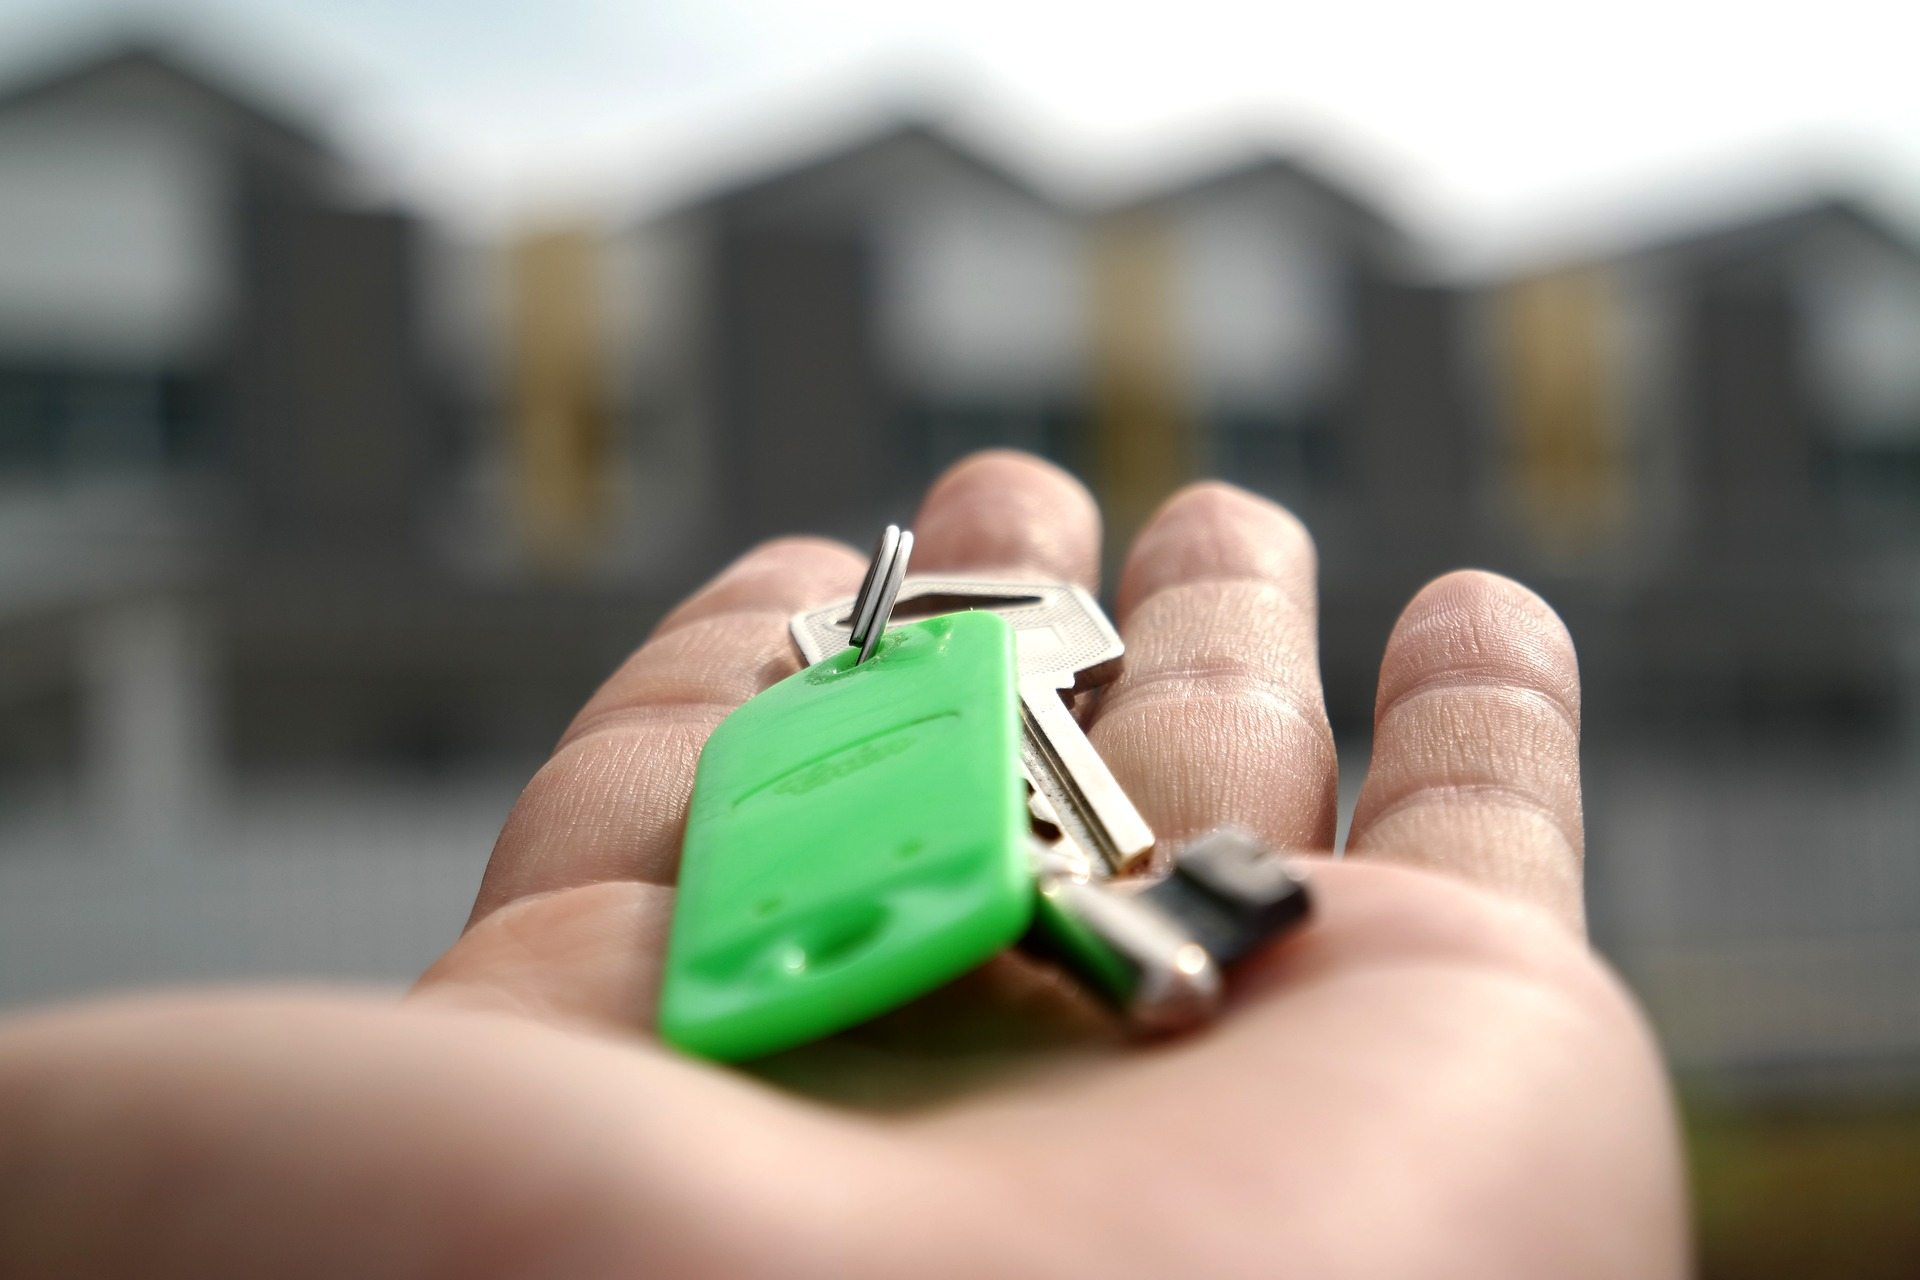 key on hand